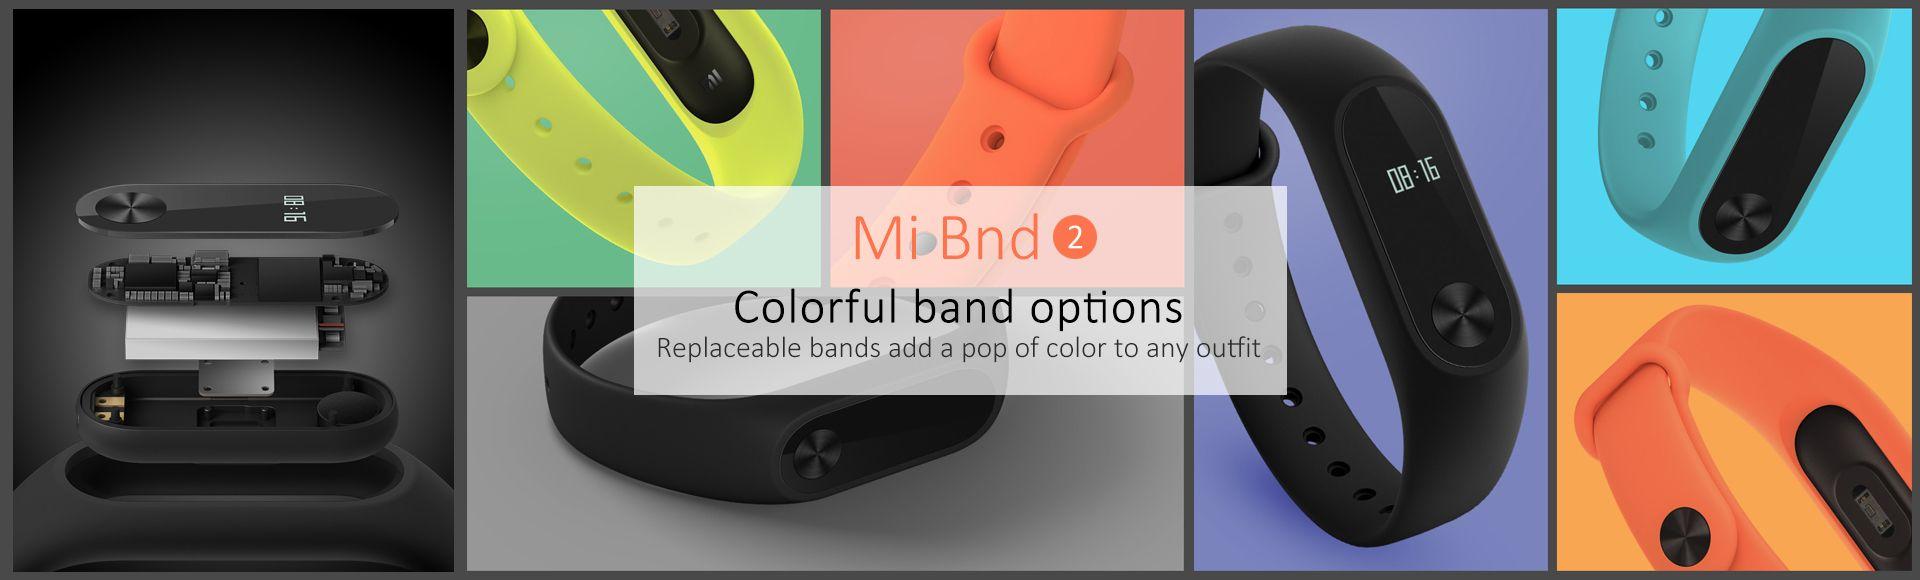 Xiaomi Mi Band 2 - Heart rate sensor Sleep monitor Step tracker